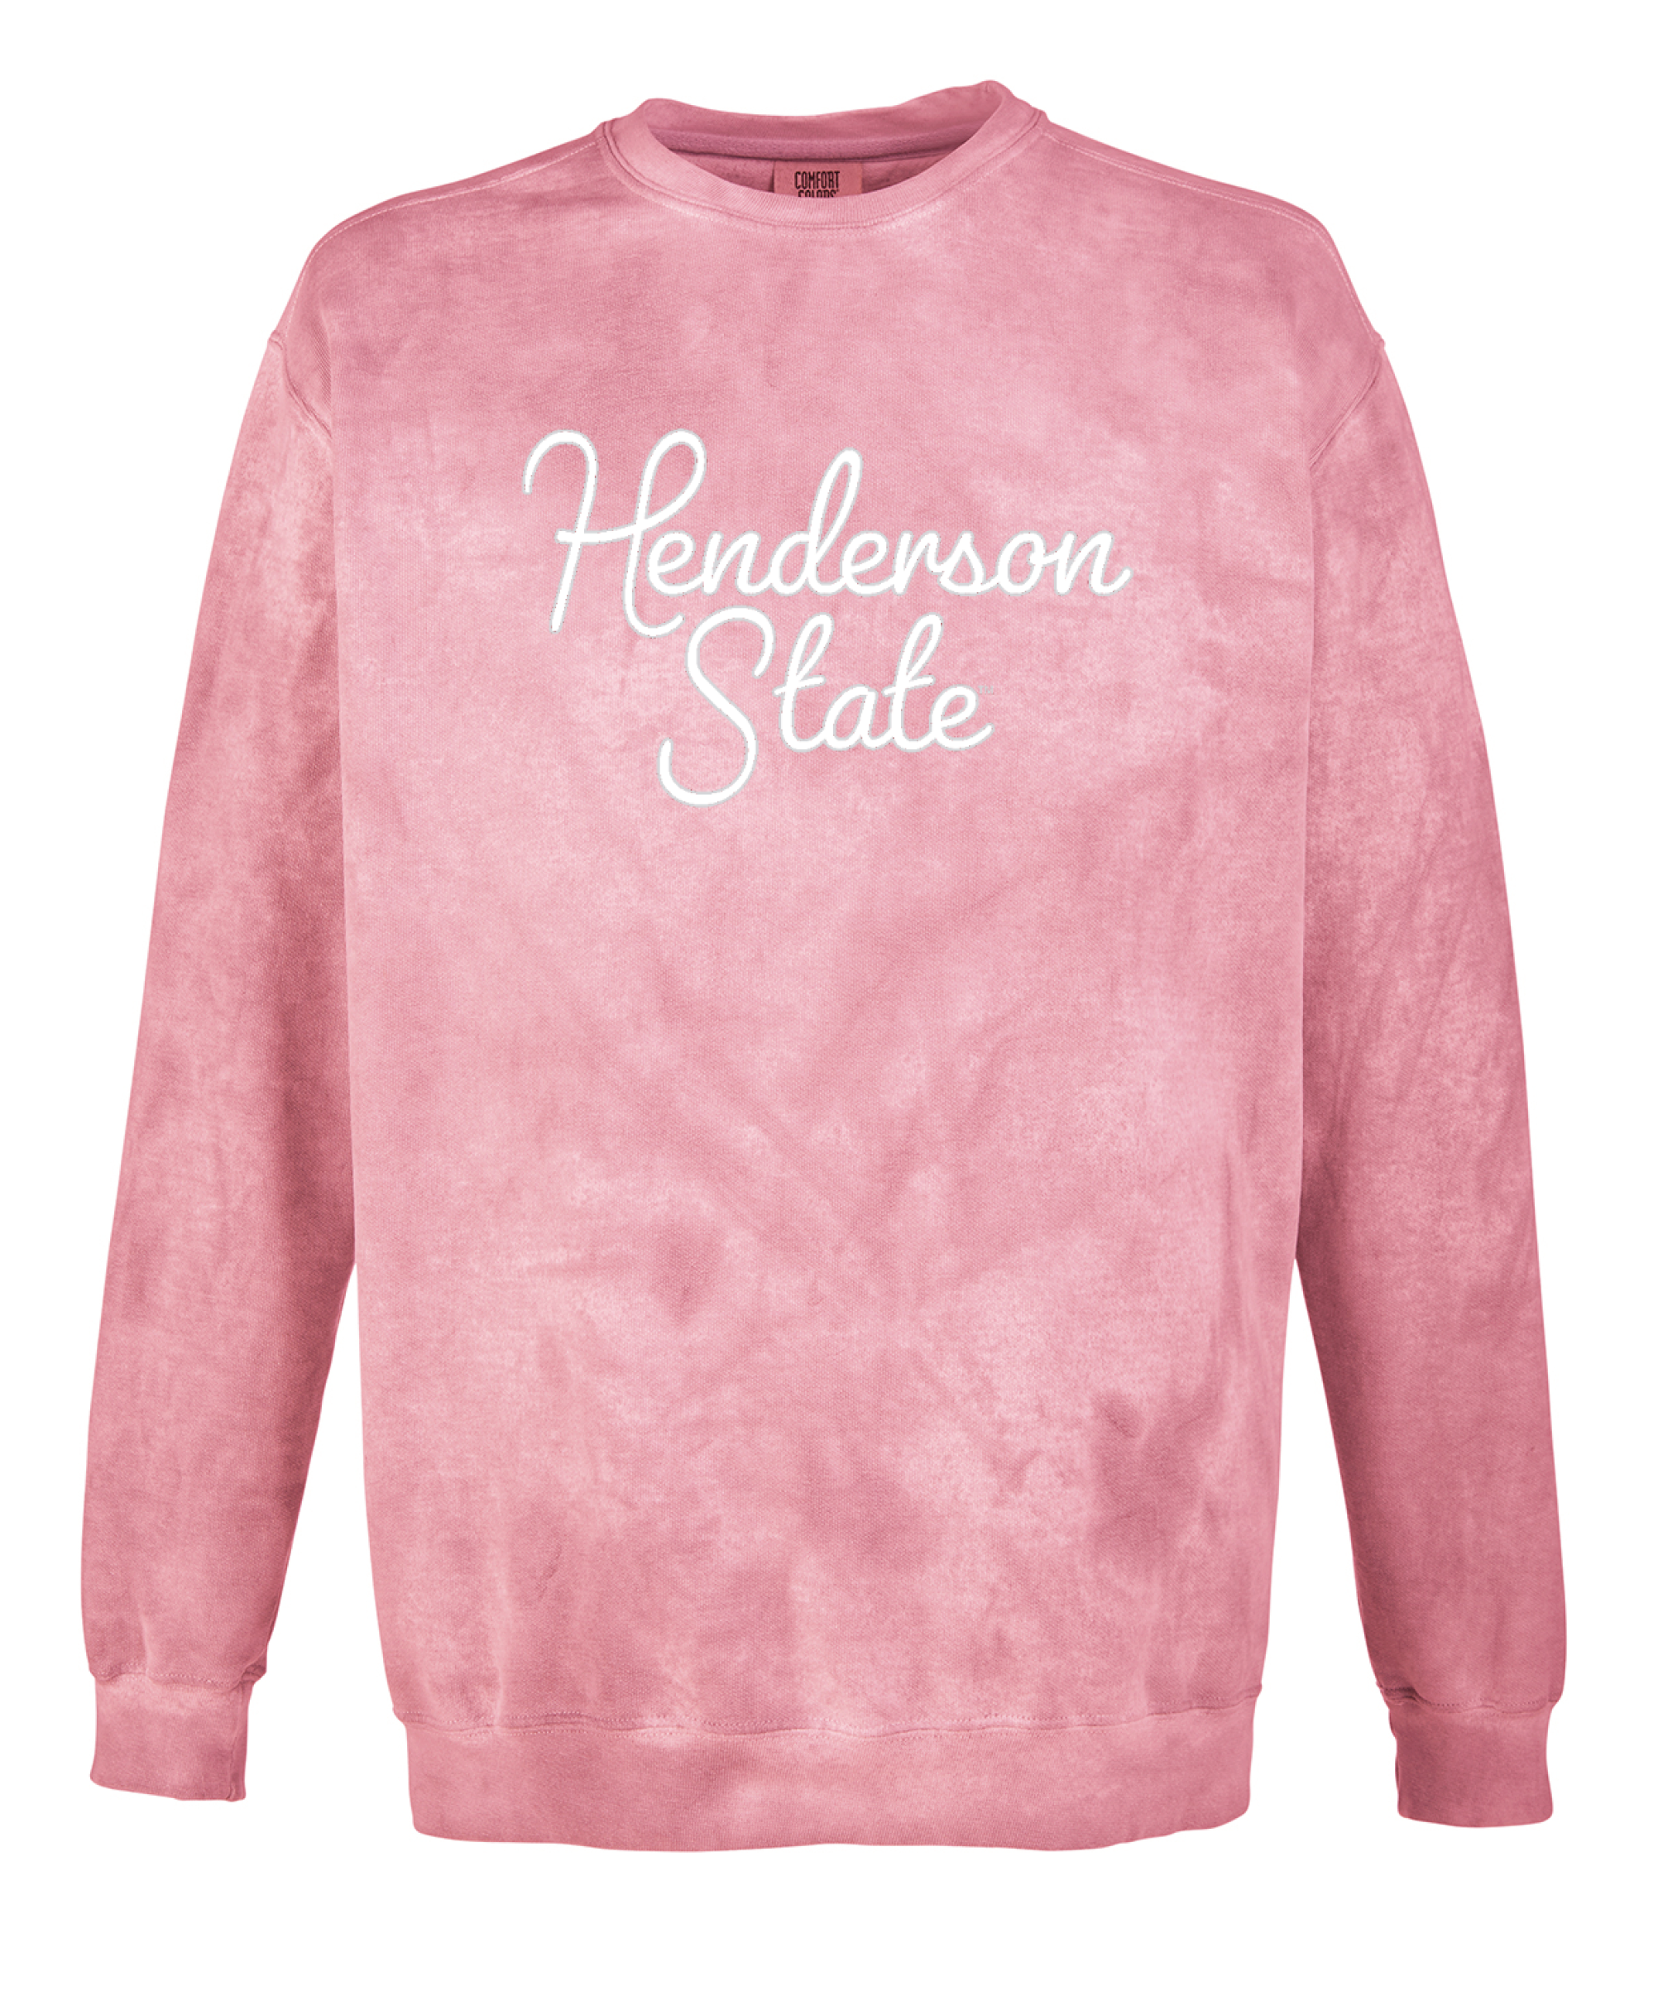 image of: Henderson State Comfort Colors Color Blast Crew Neck Sweatshirt